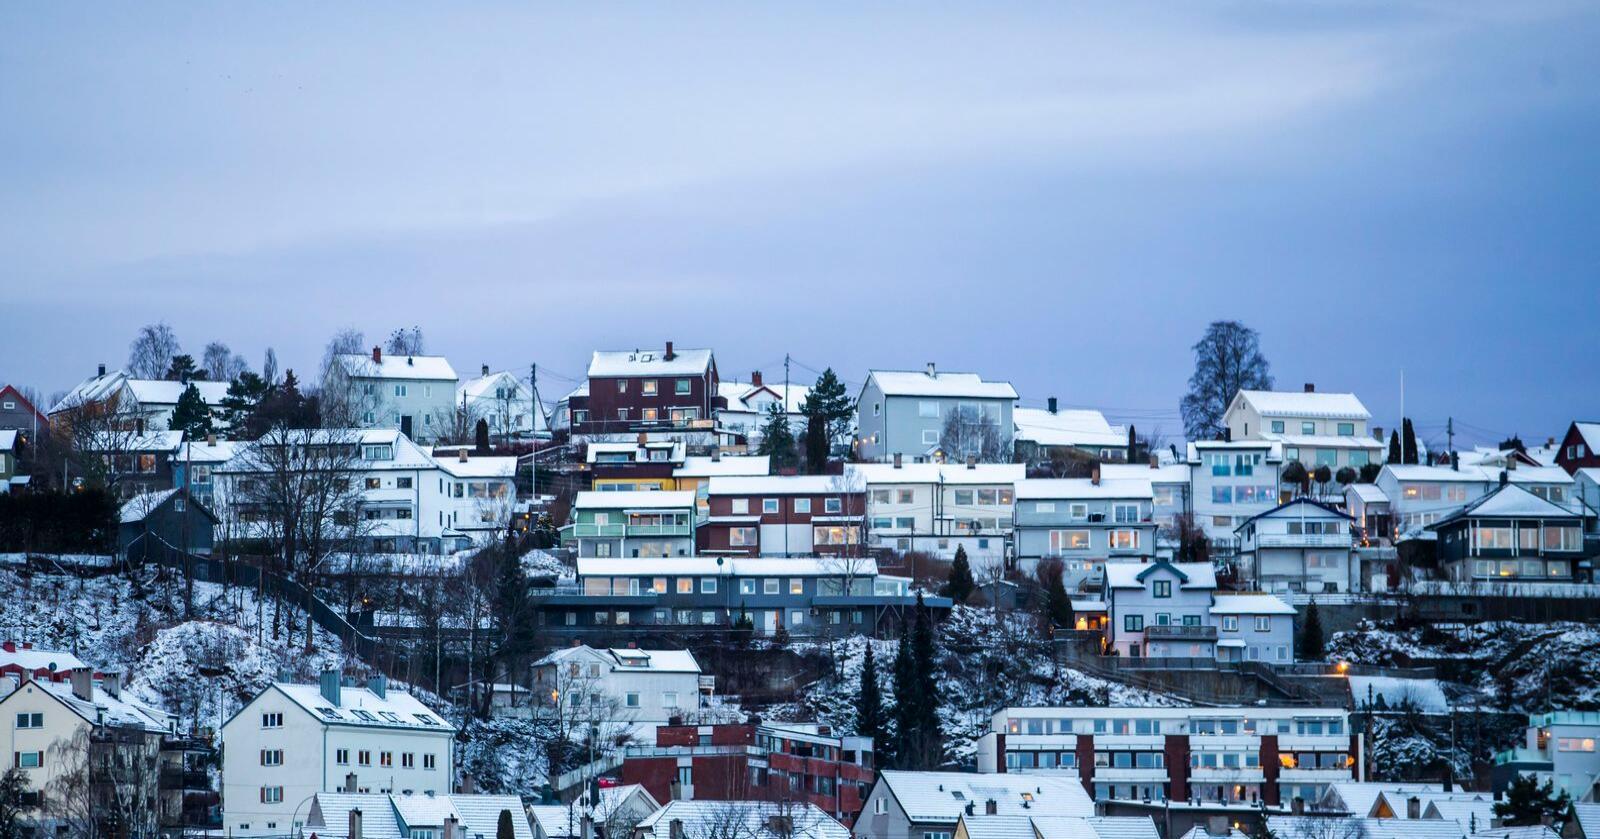 Totalt 242 kommuner i Norge har eiendomsskatt på boliger i 2020. Illustrasjonsfoto: Håkon Mosvold Larsen / NTB scanpix